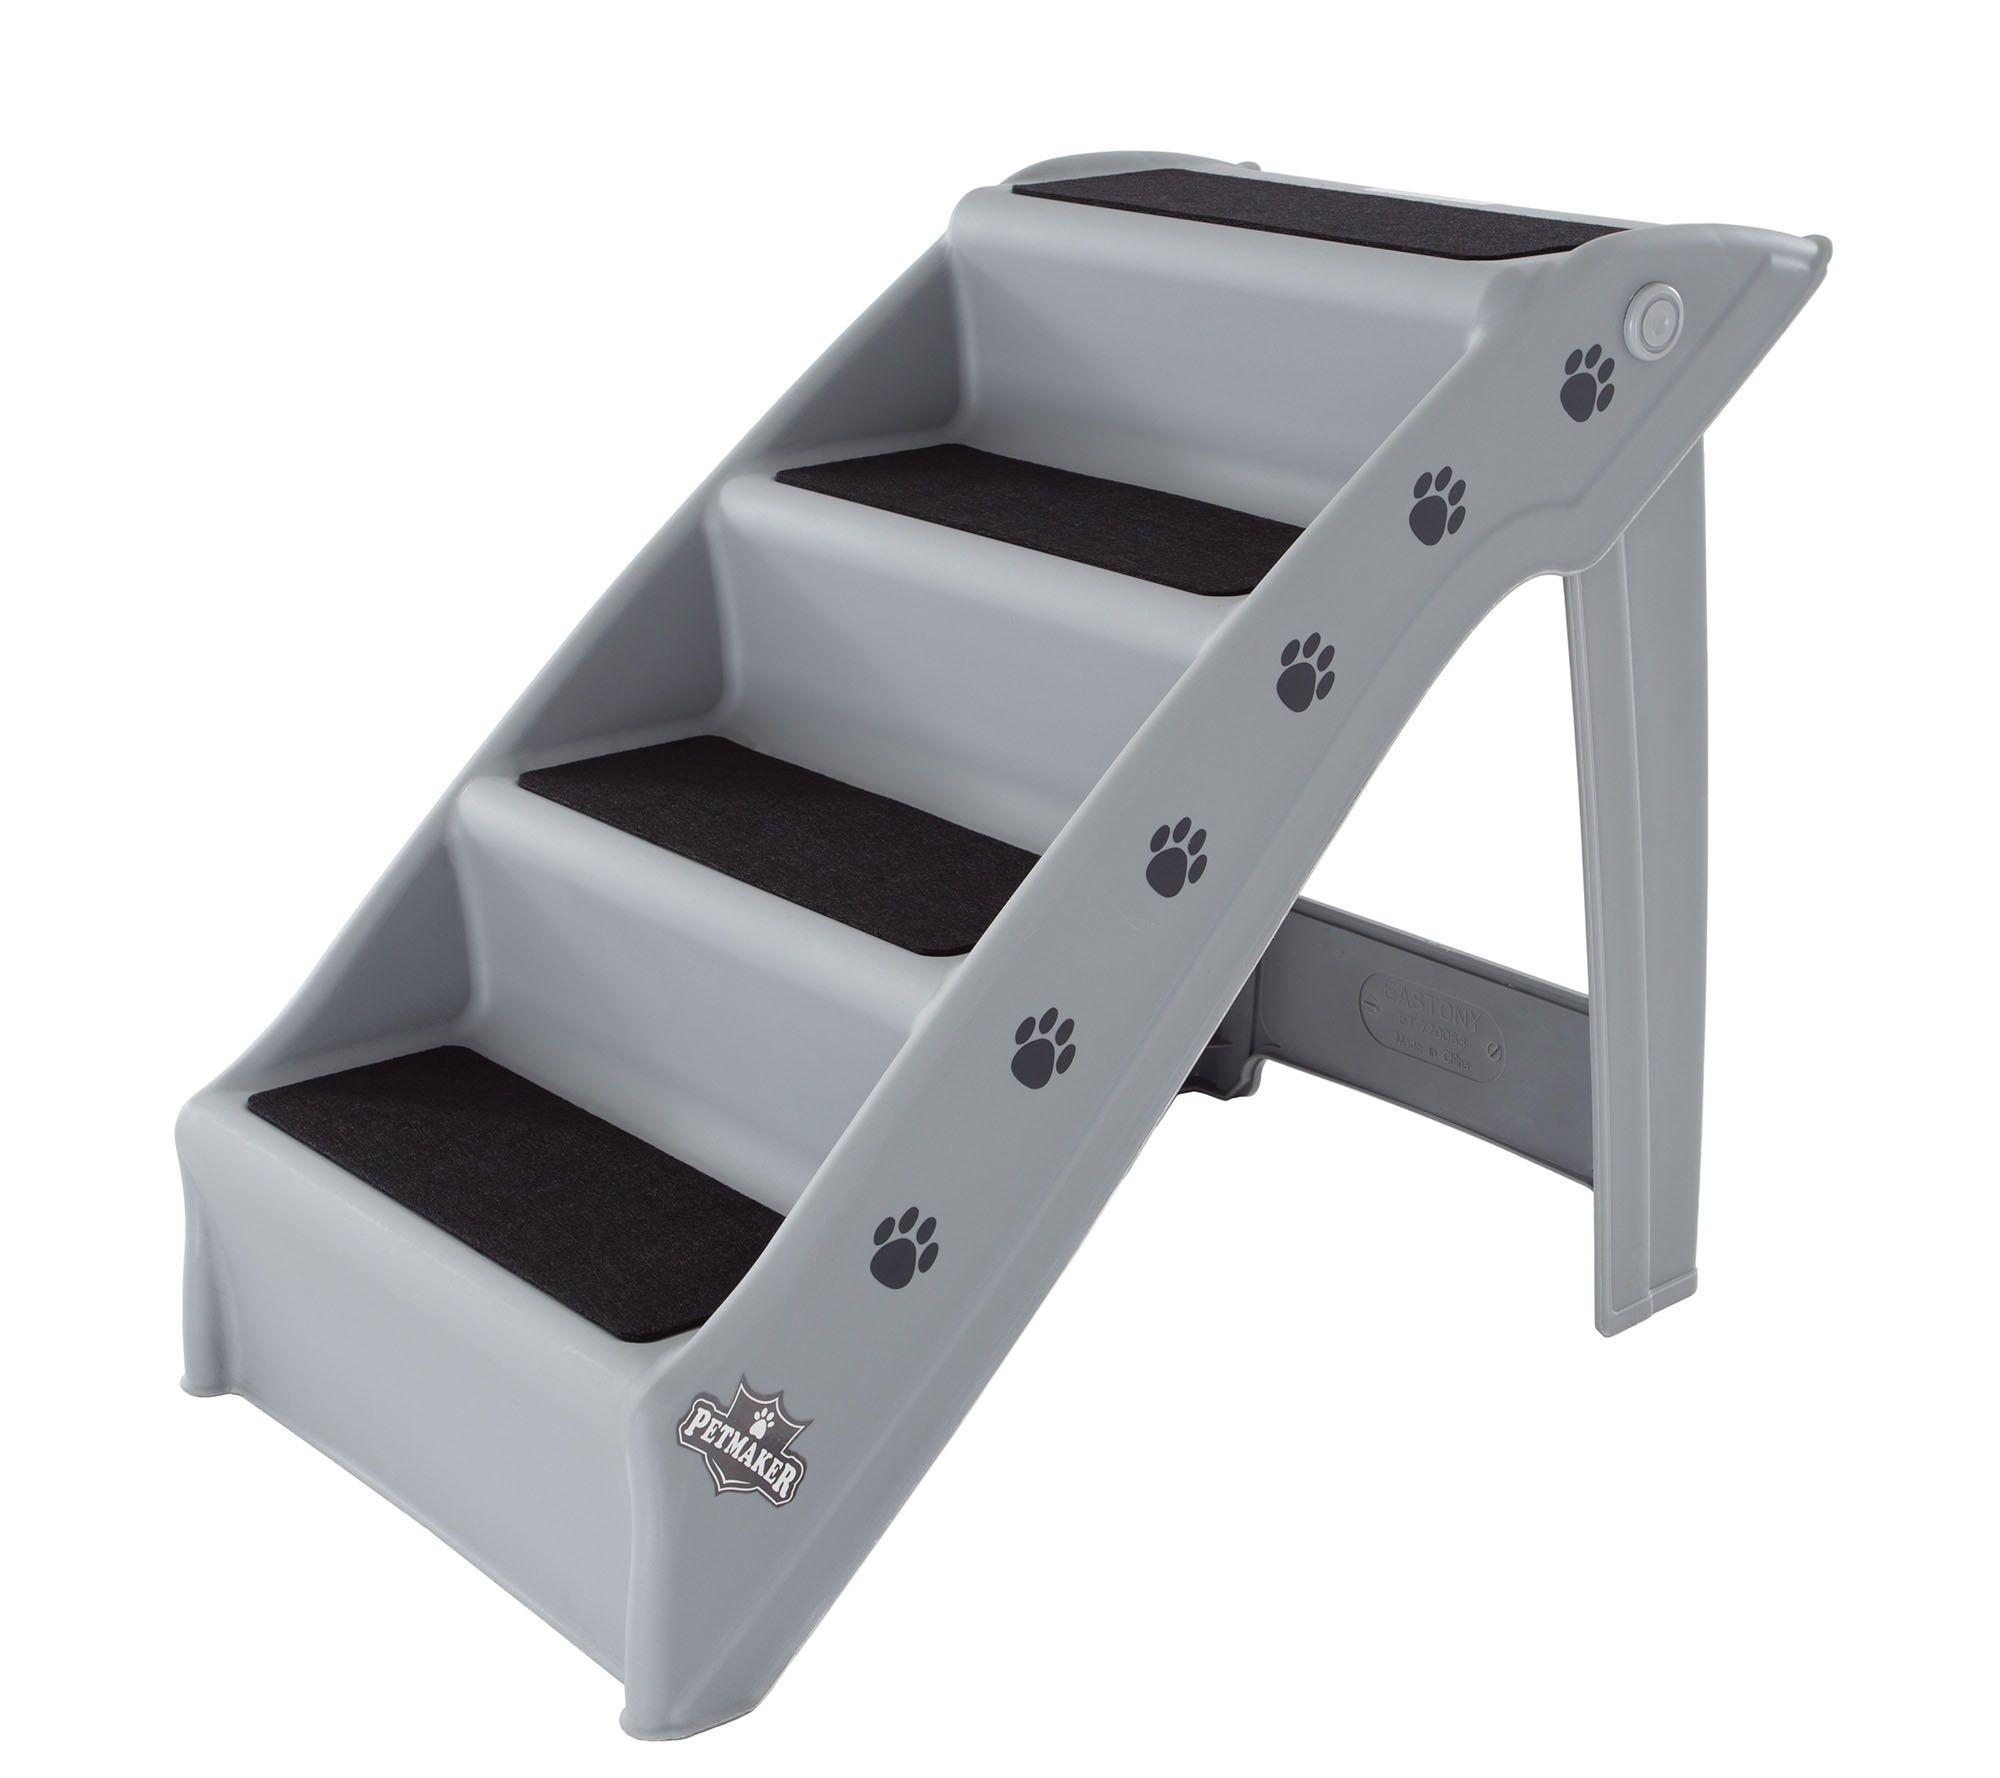 Awe Inspiring Petmaker 4 Step Folding Plastic Pet Stairs Qvc Com Dailytribune Chair Design For Home Dailytribuneorg